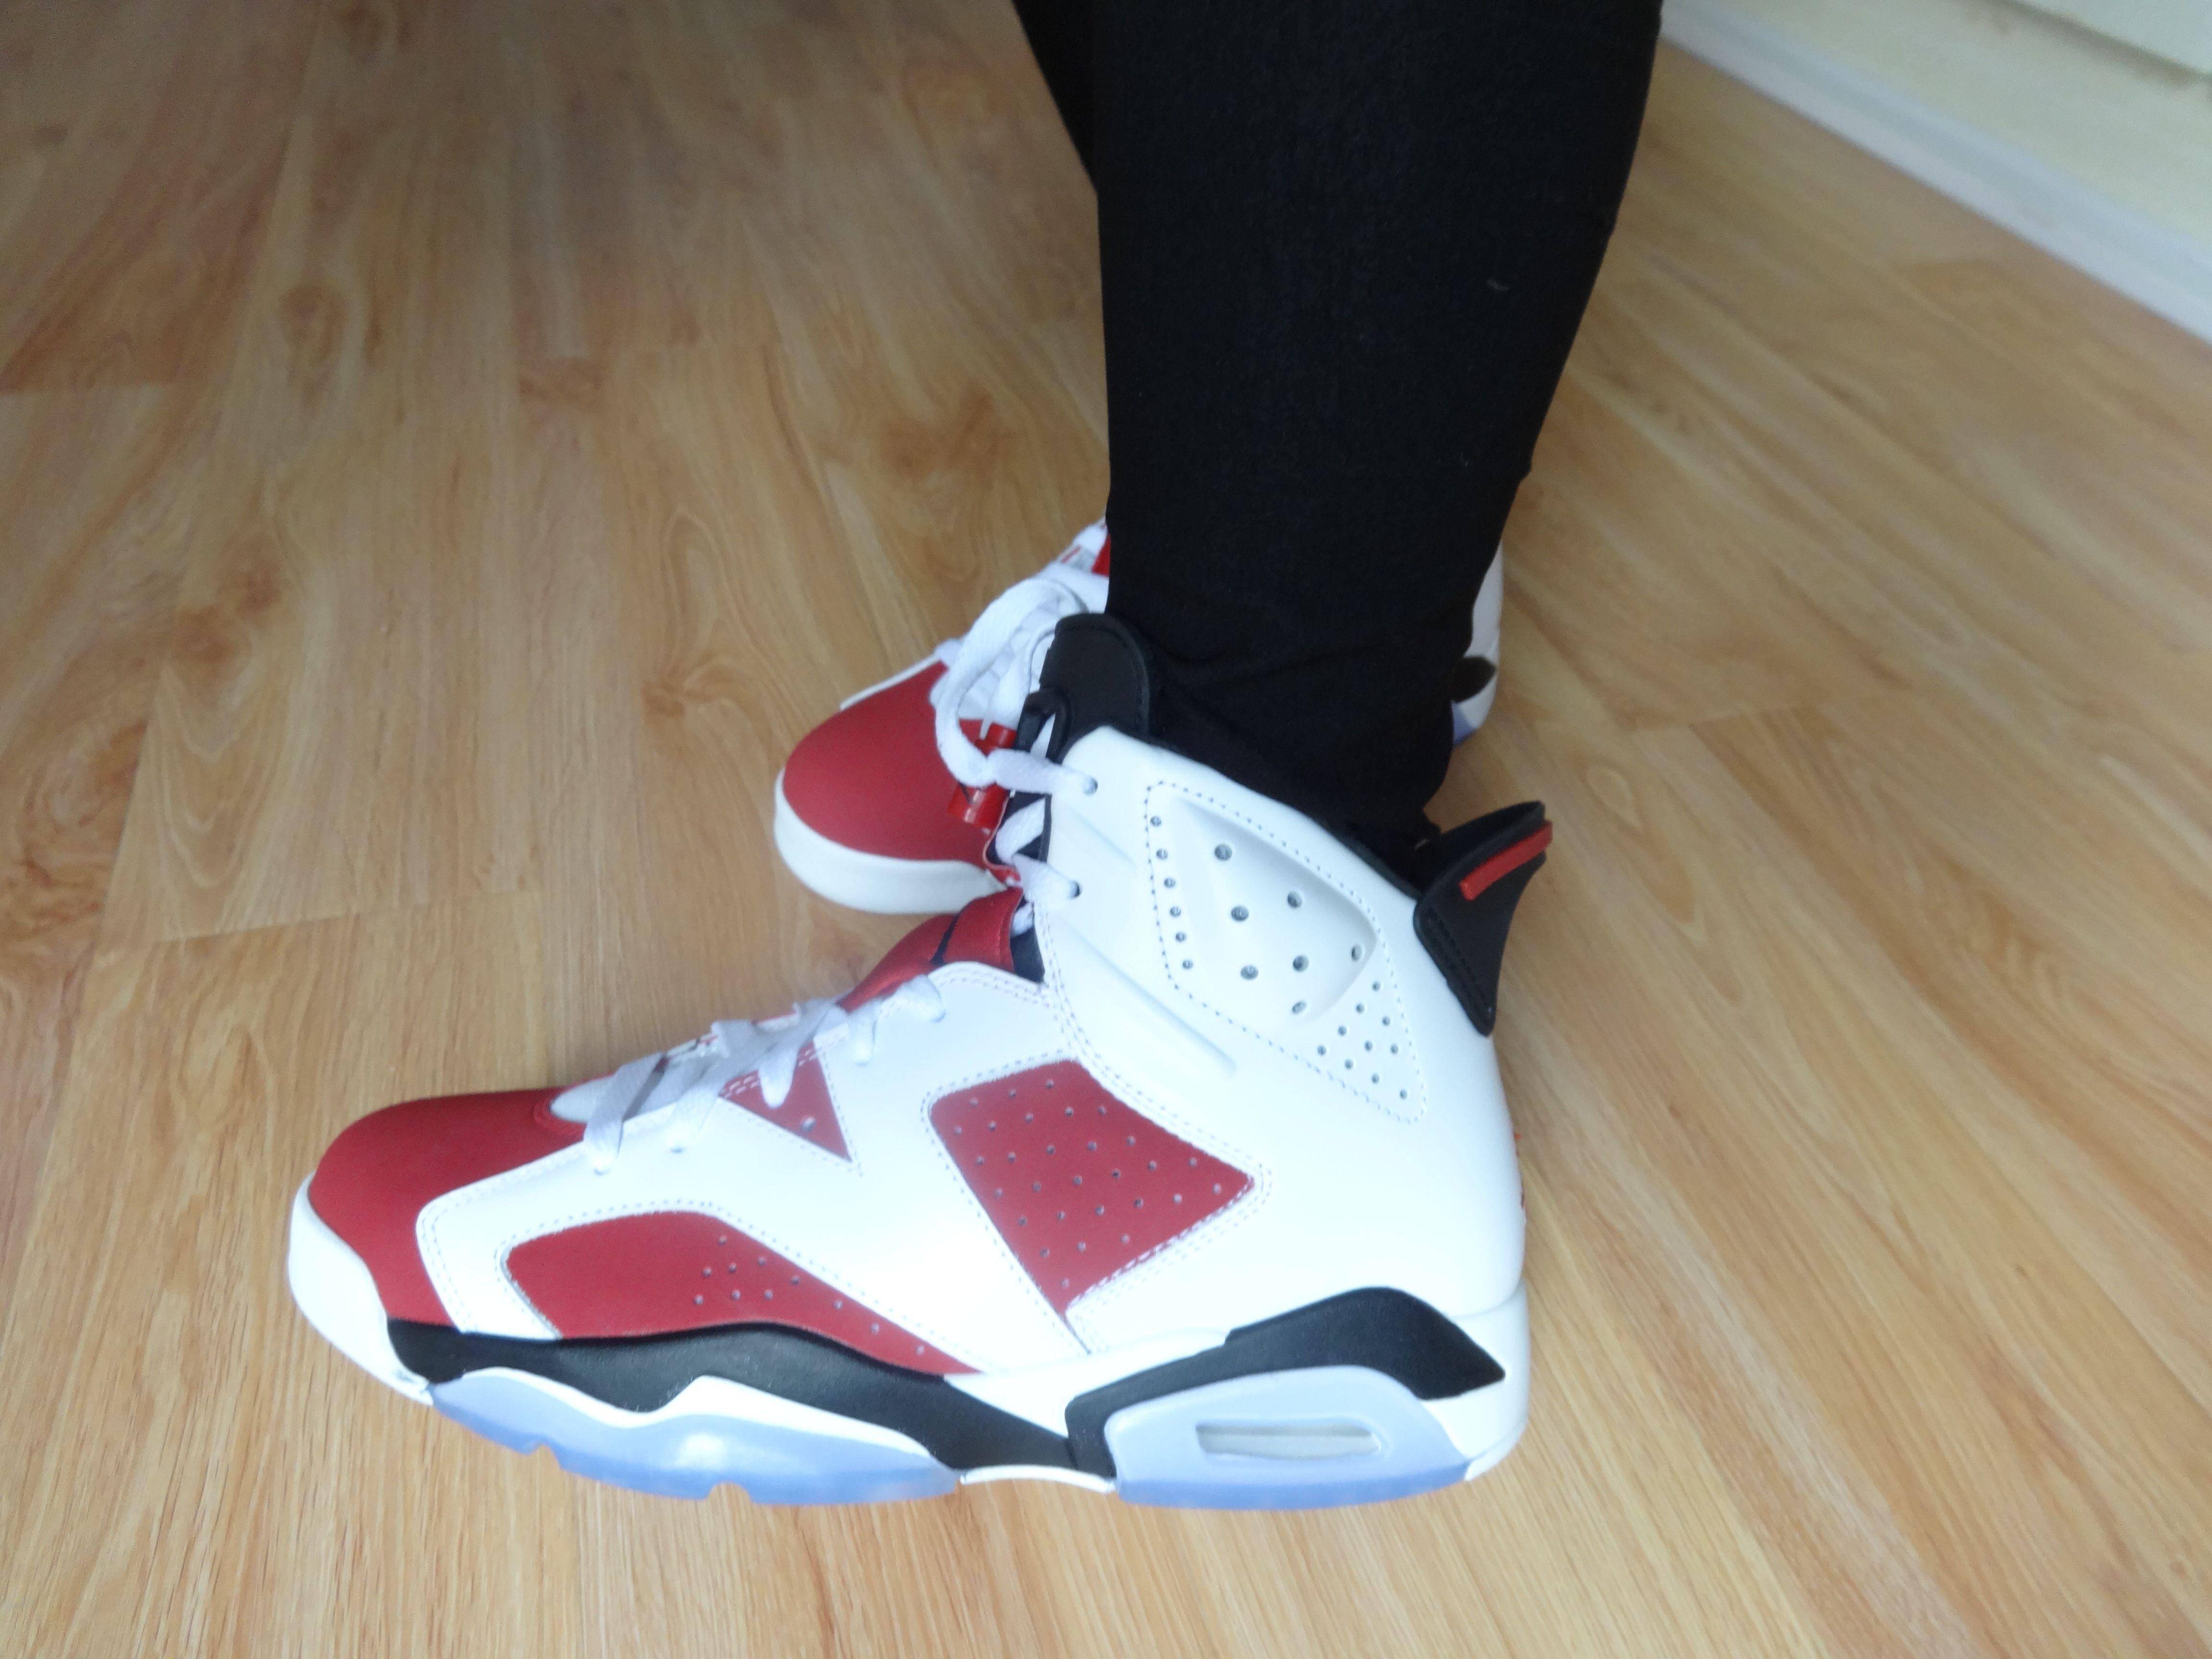 super popular 13aba 8b295 jordan 6 carmine on foot!159$ | Jordan sneakers | Sneakers ...